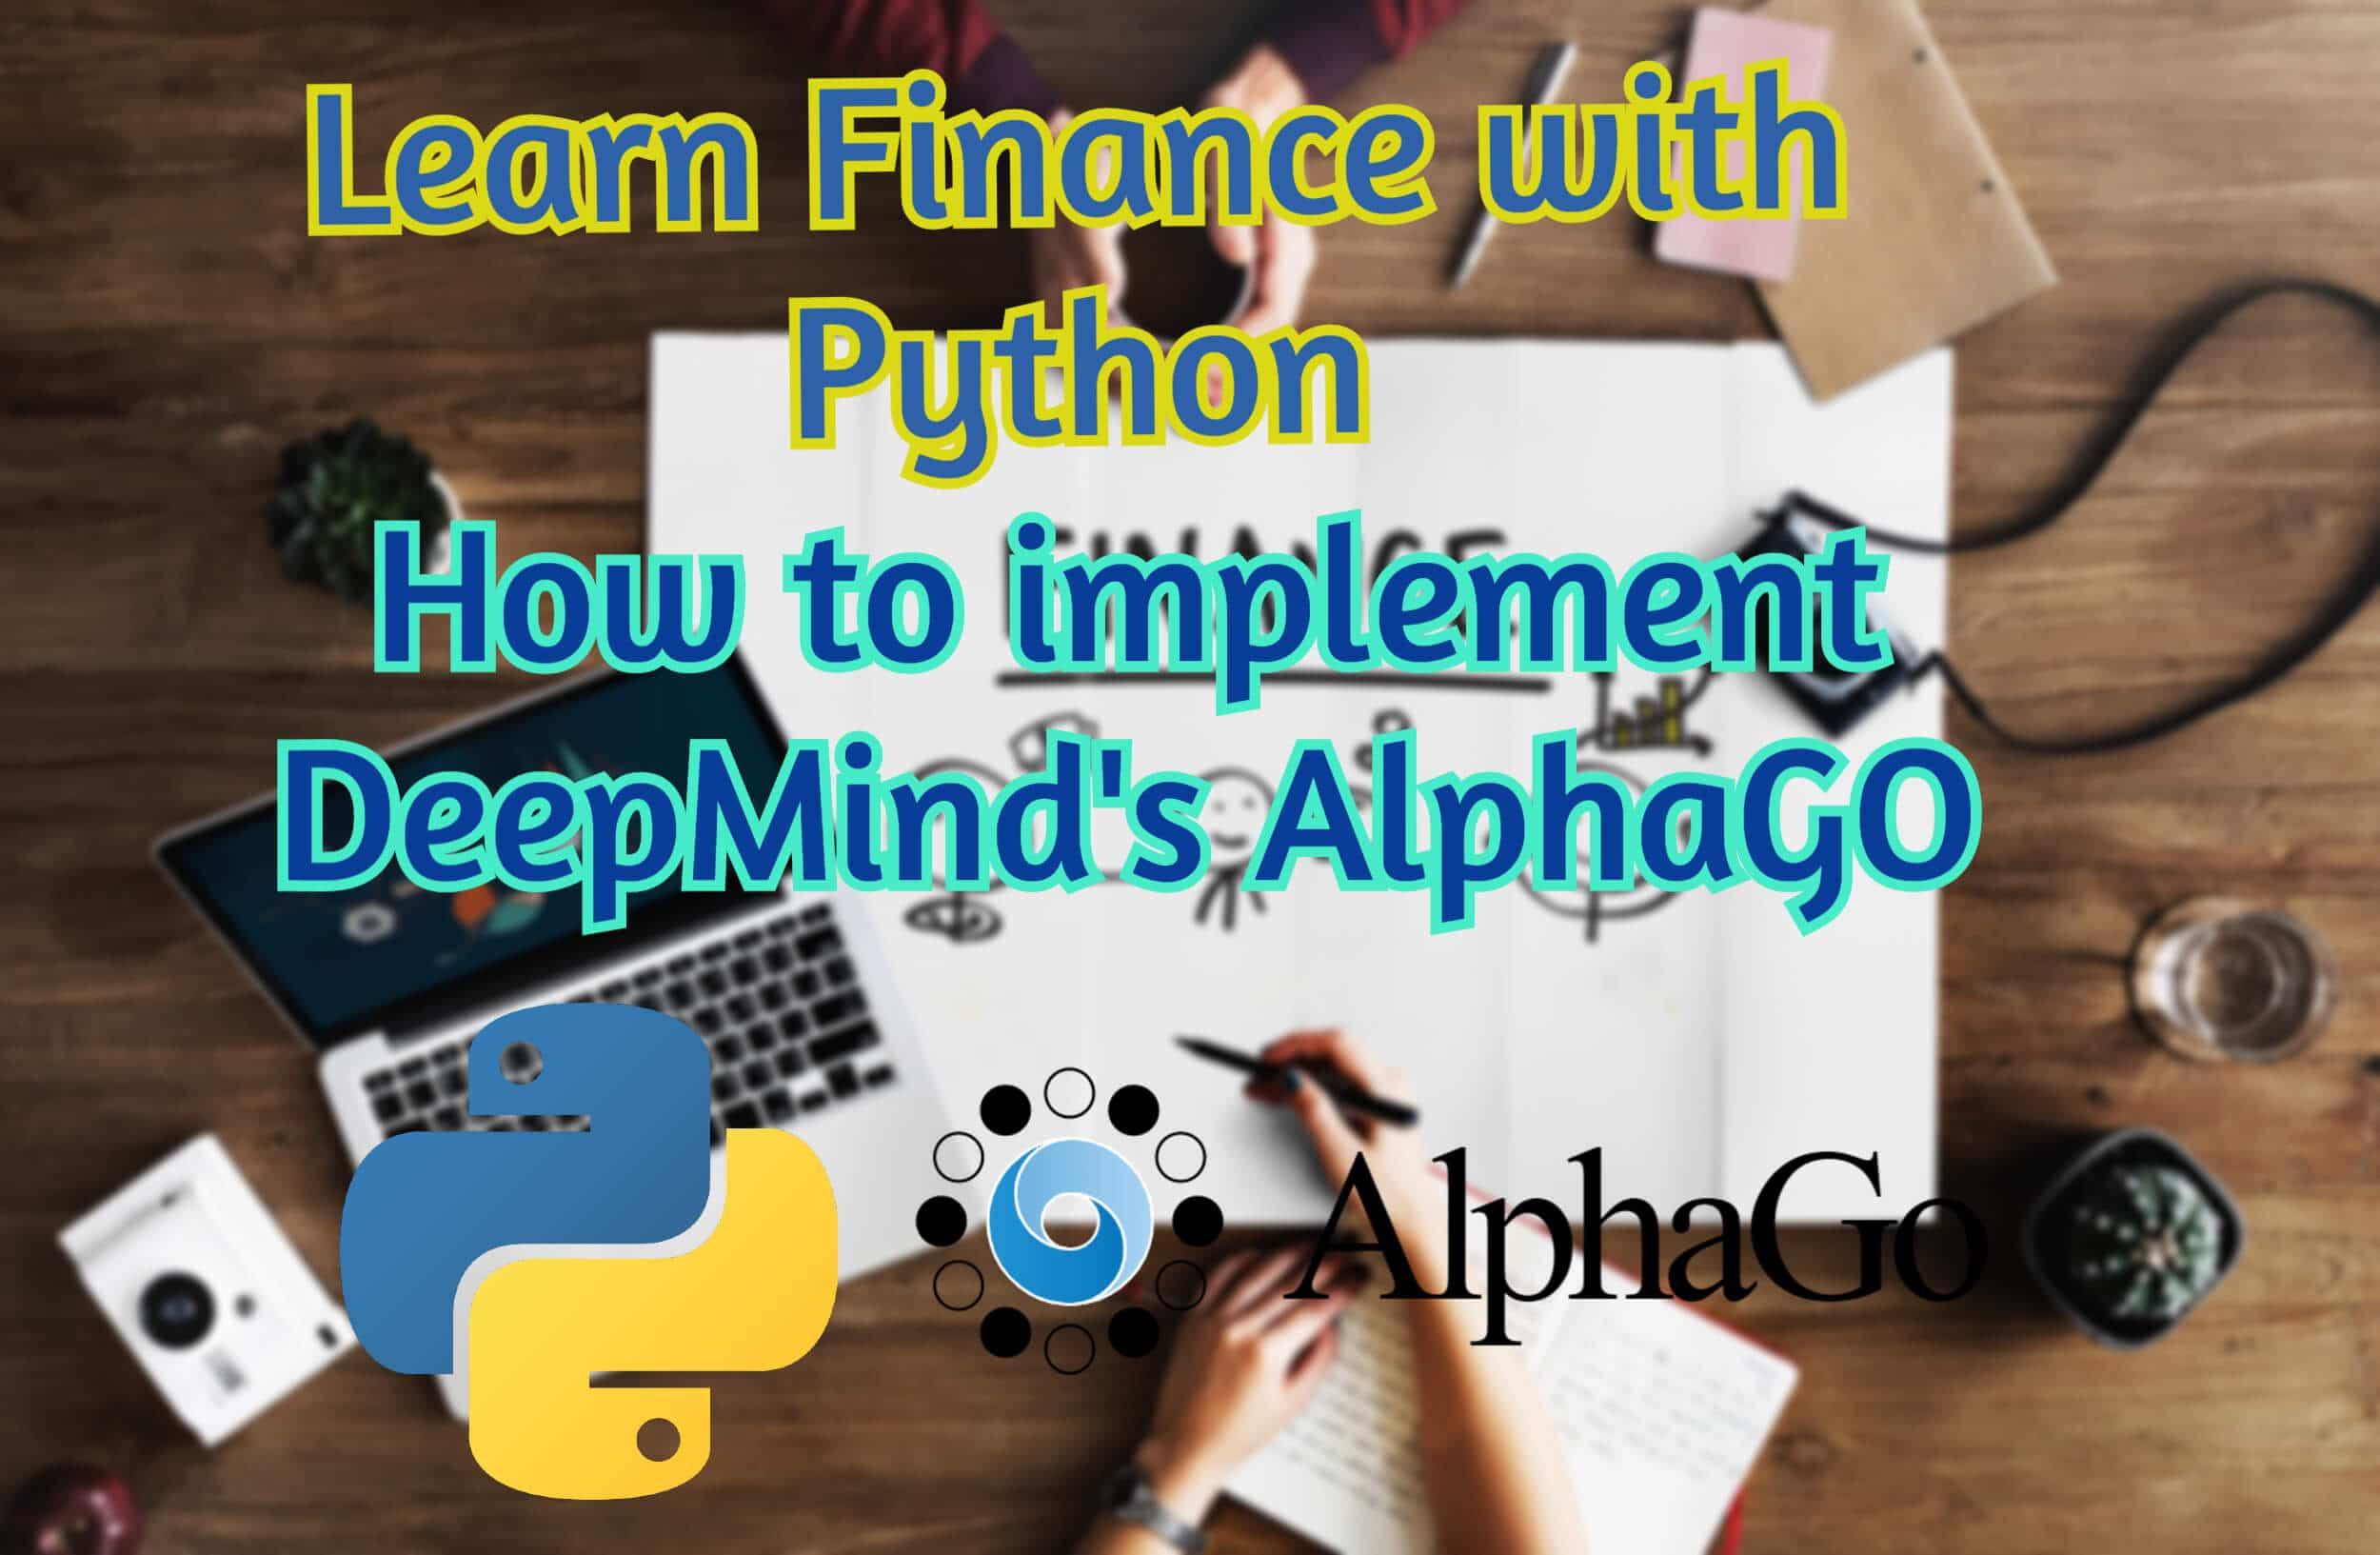 Finance with Python: Monte Carlo Simulation (the backbone of DeepMind's AlphaGo algorithm)